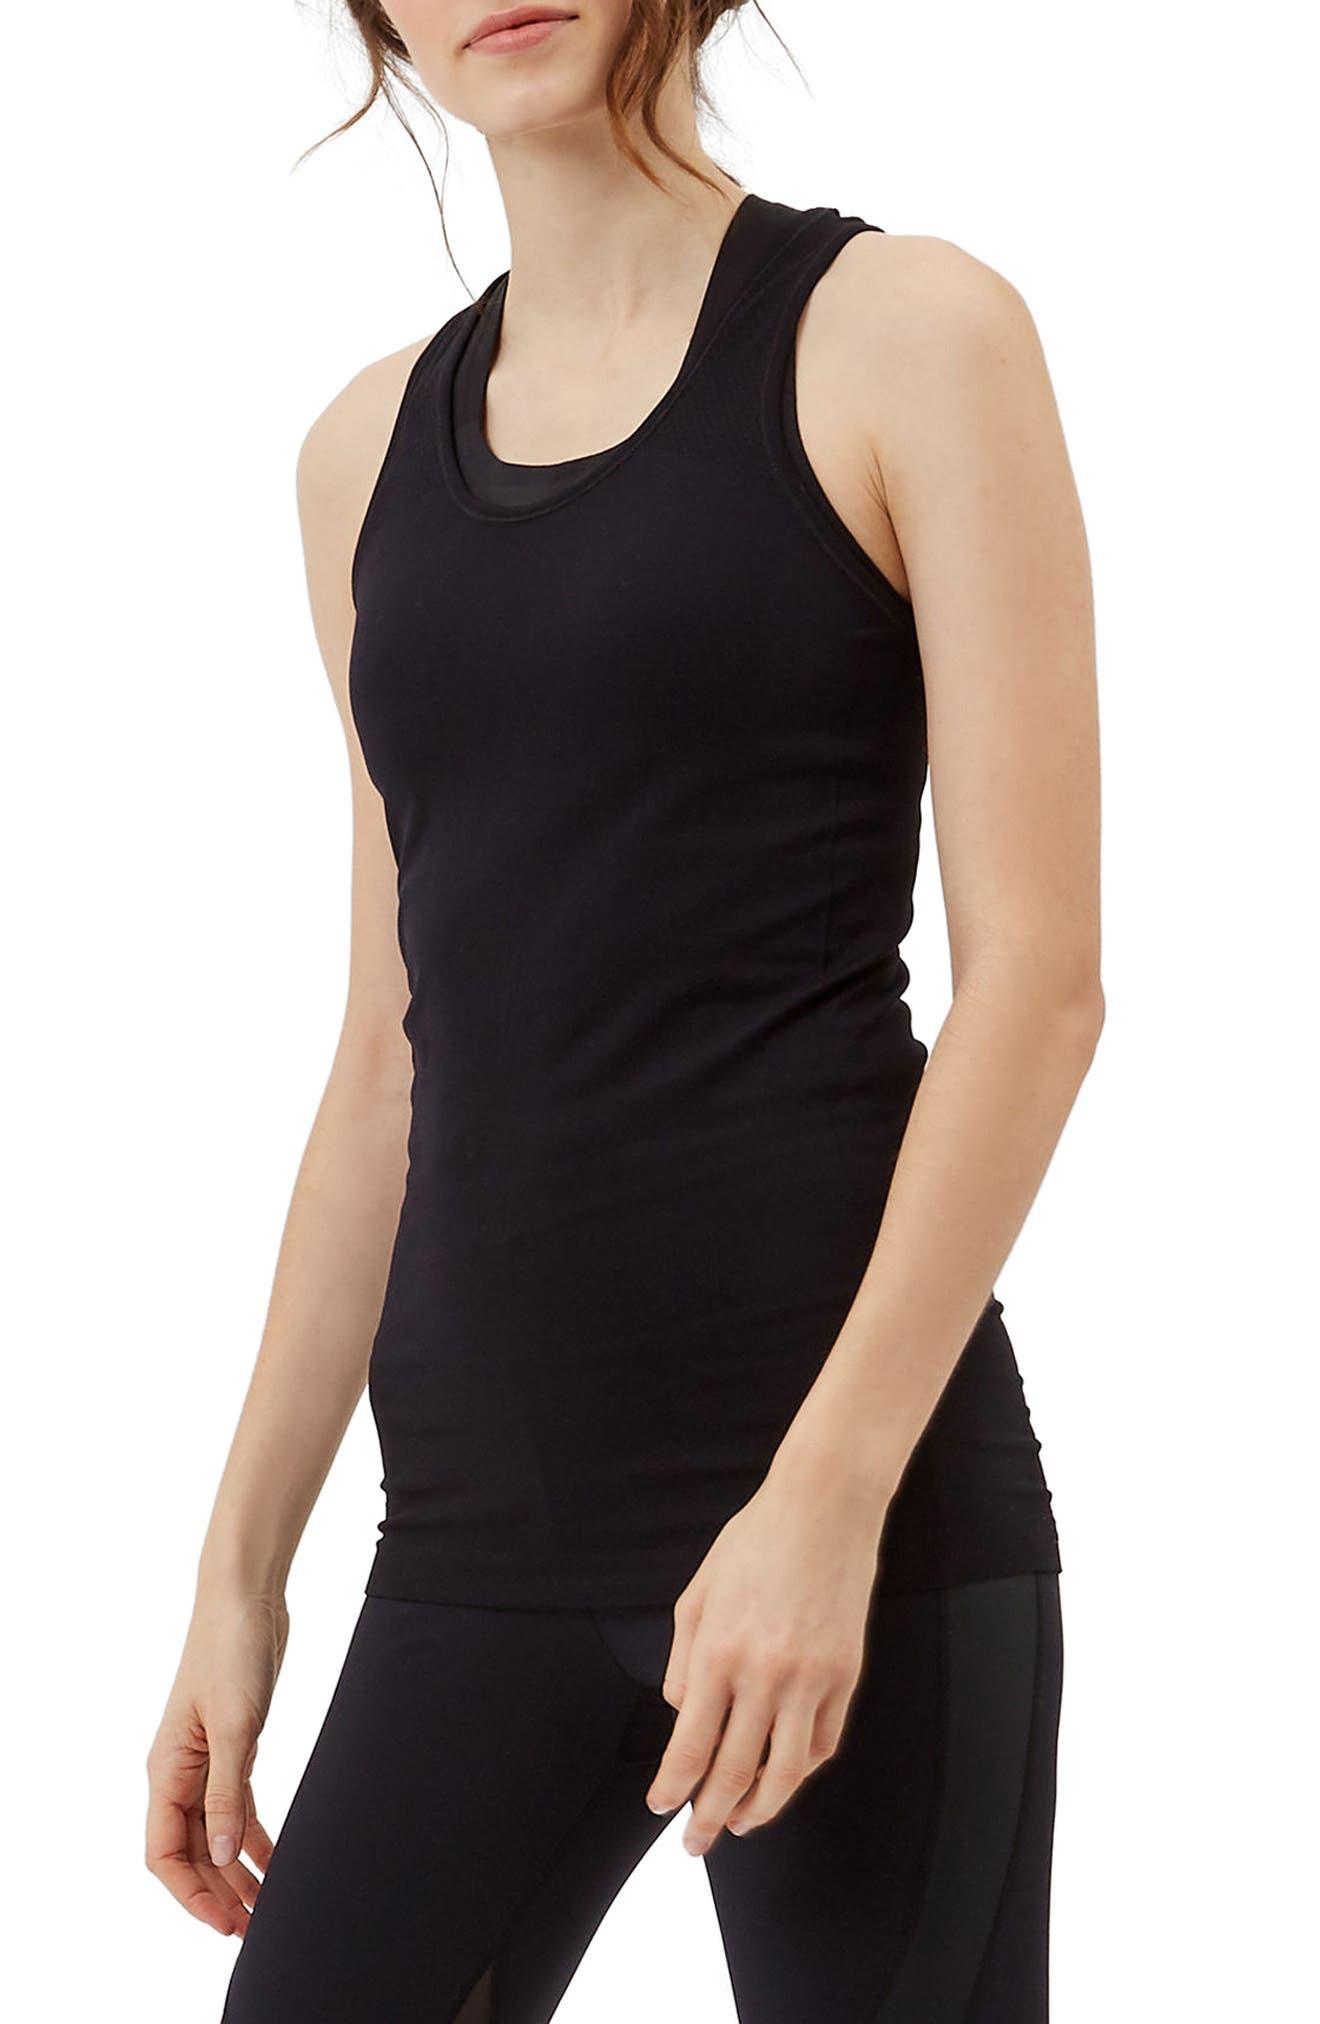 Athlete Seamless Workout Tank,                             Alternate thumbnail 3, color,                             BLACK